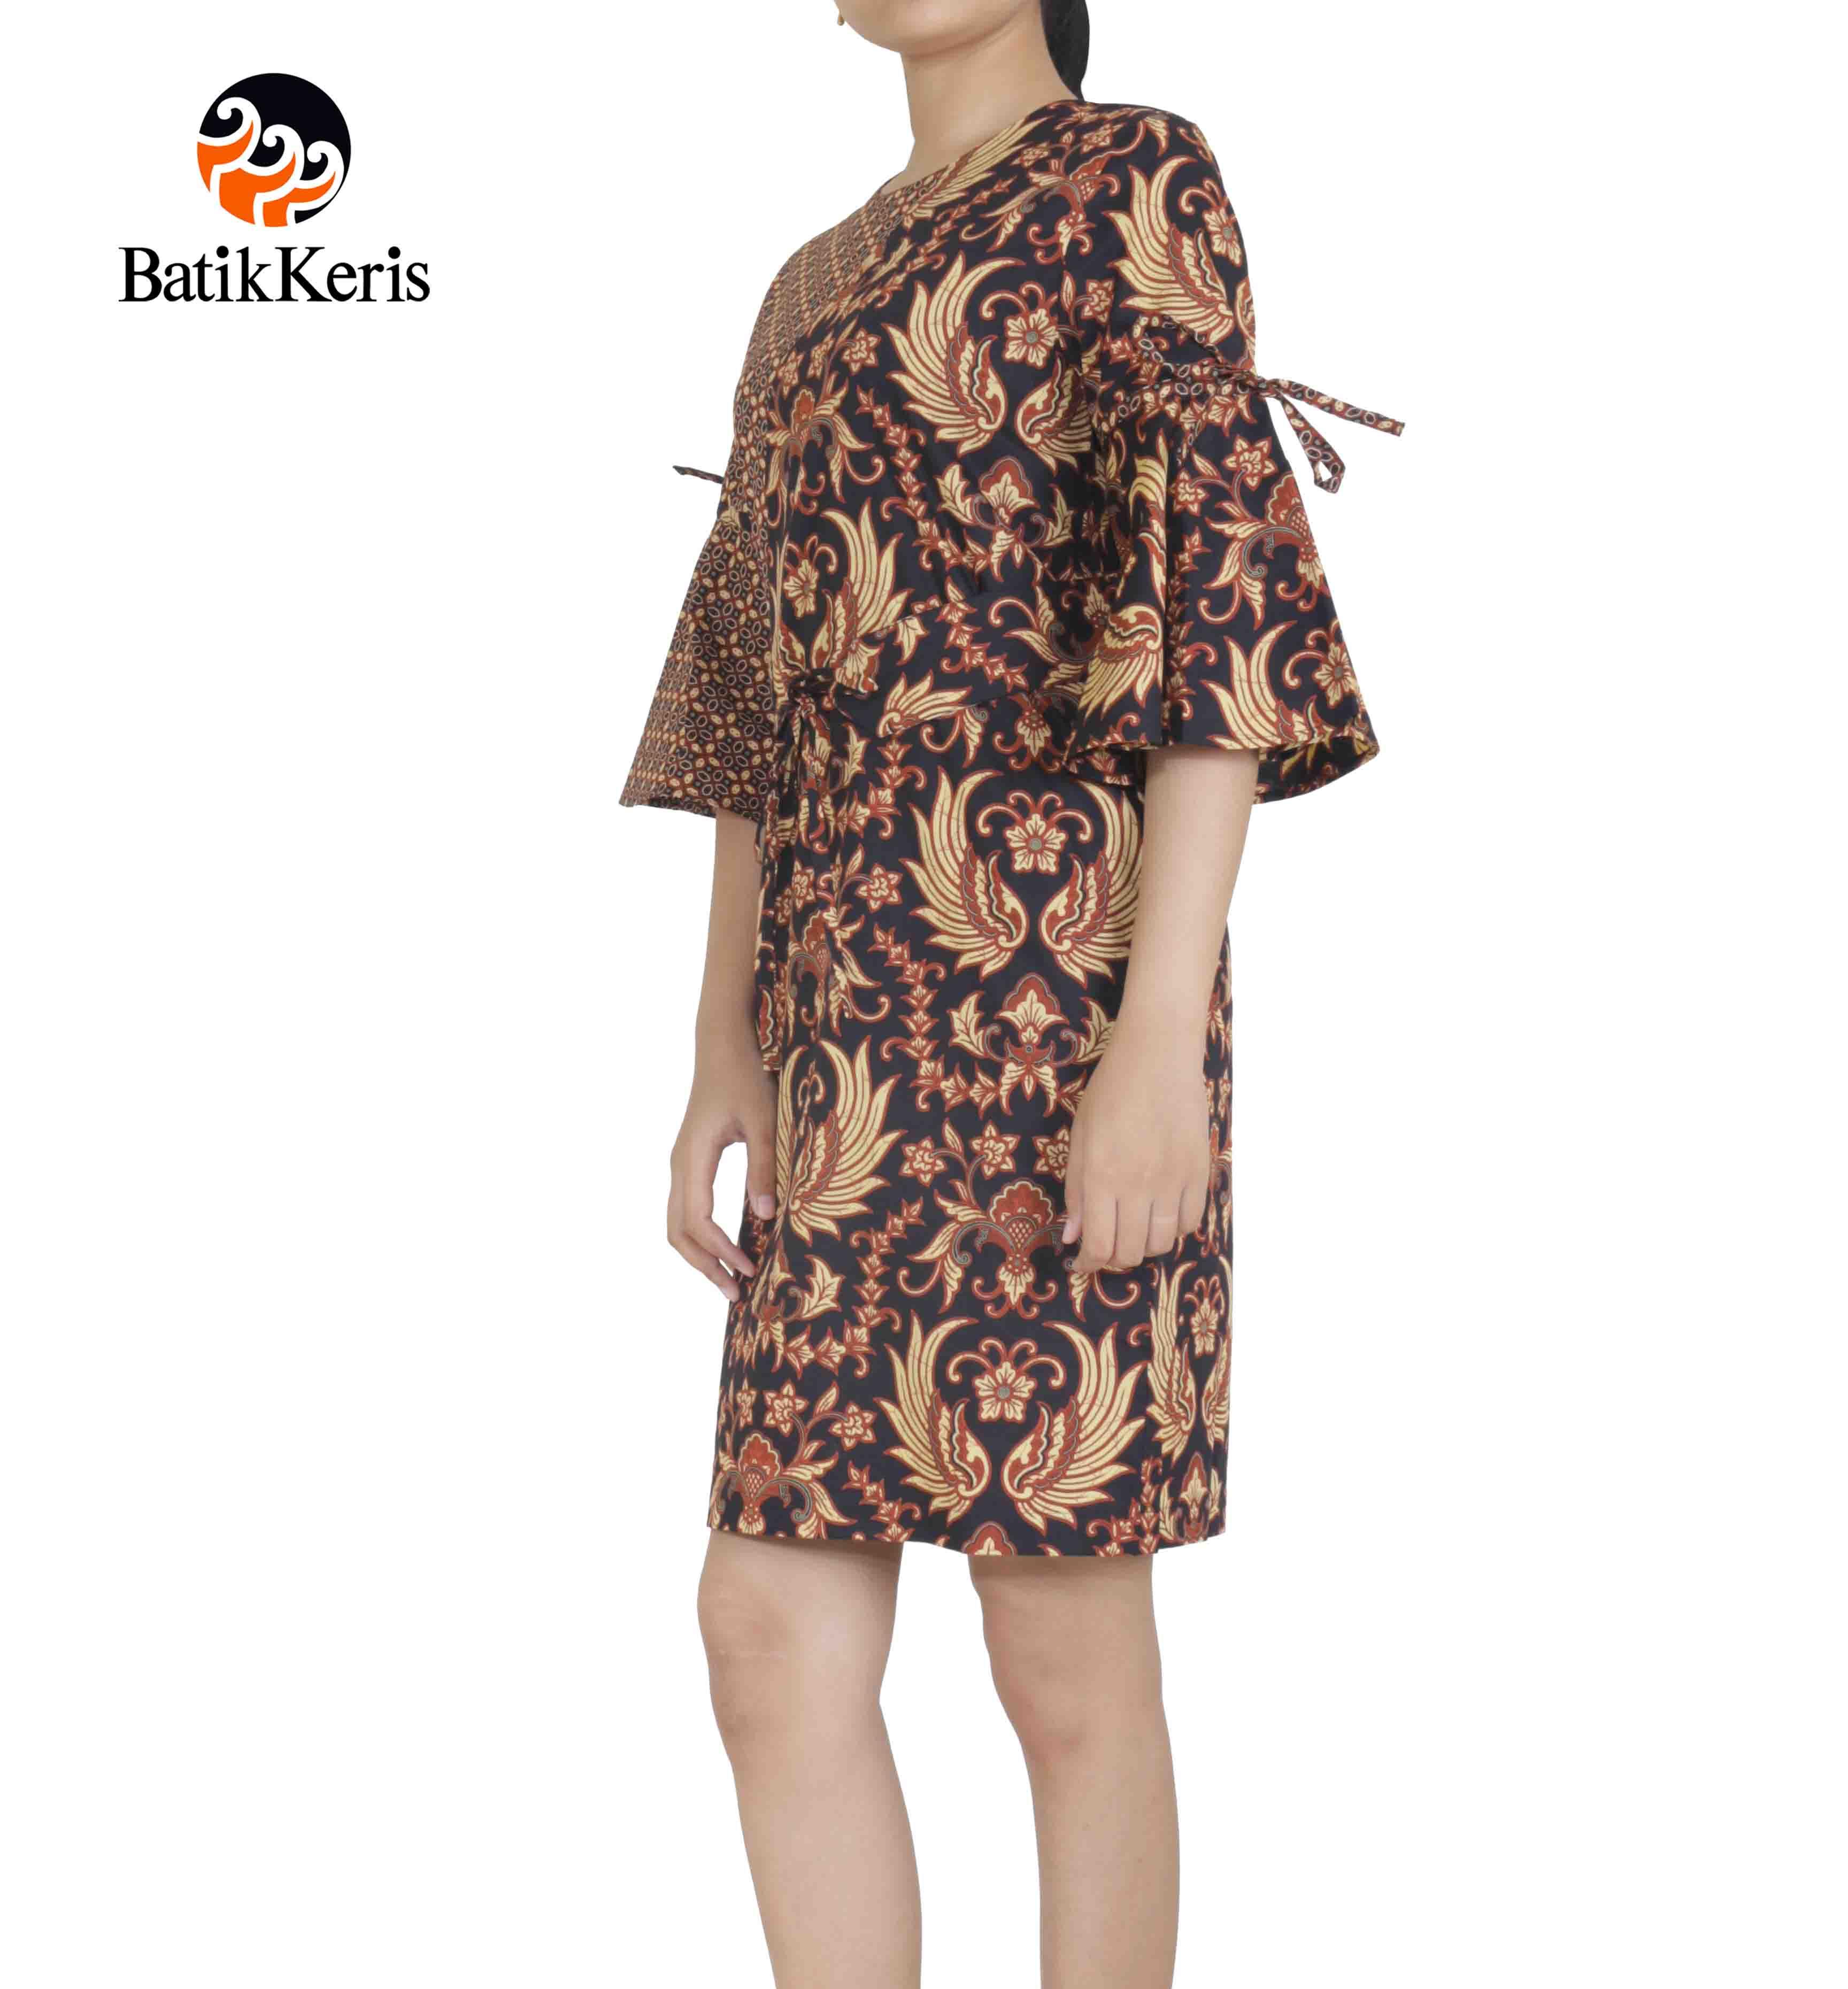 Batik Keris Online » SACKDRESS LENGAN 3 4 MOTIF GURDO KEMBAR ... be516305ab